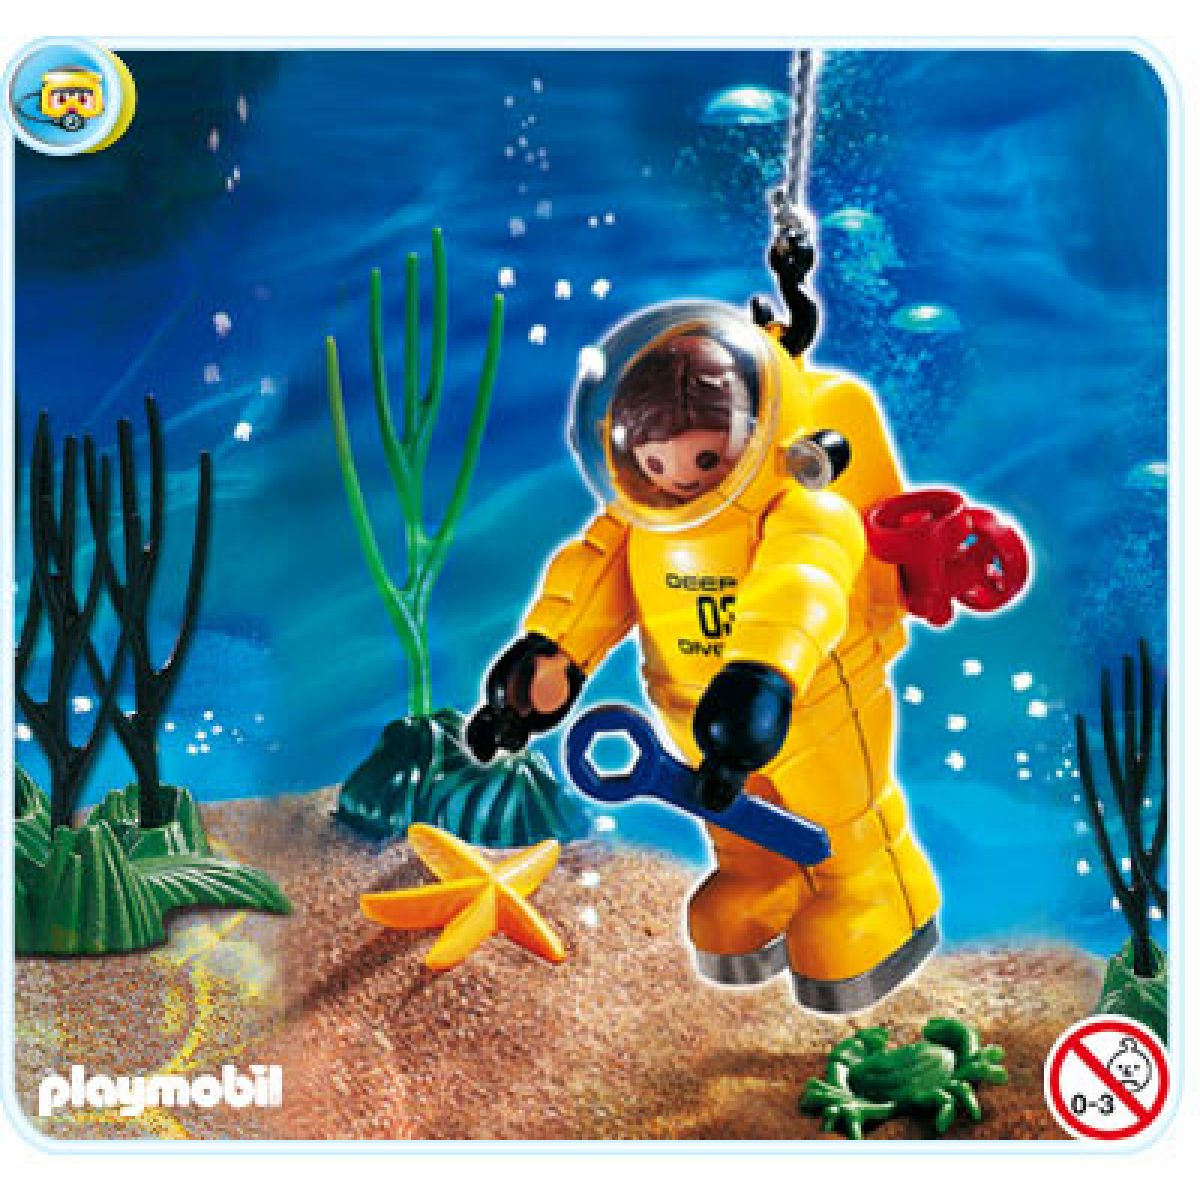 Playmobil 4479 - Hlubokomořský potápěč